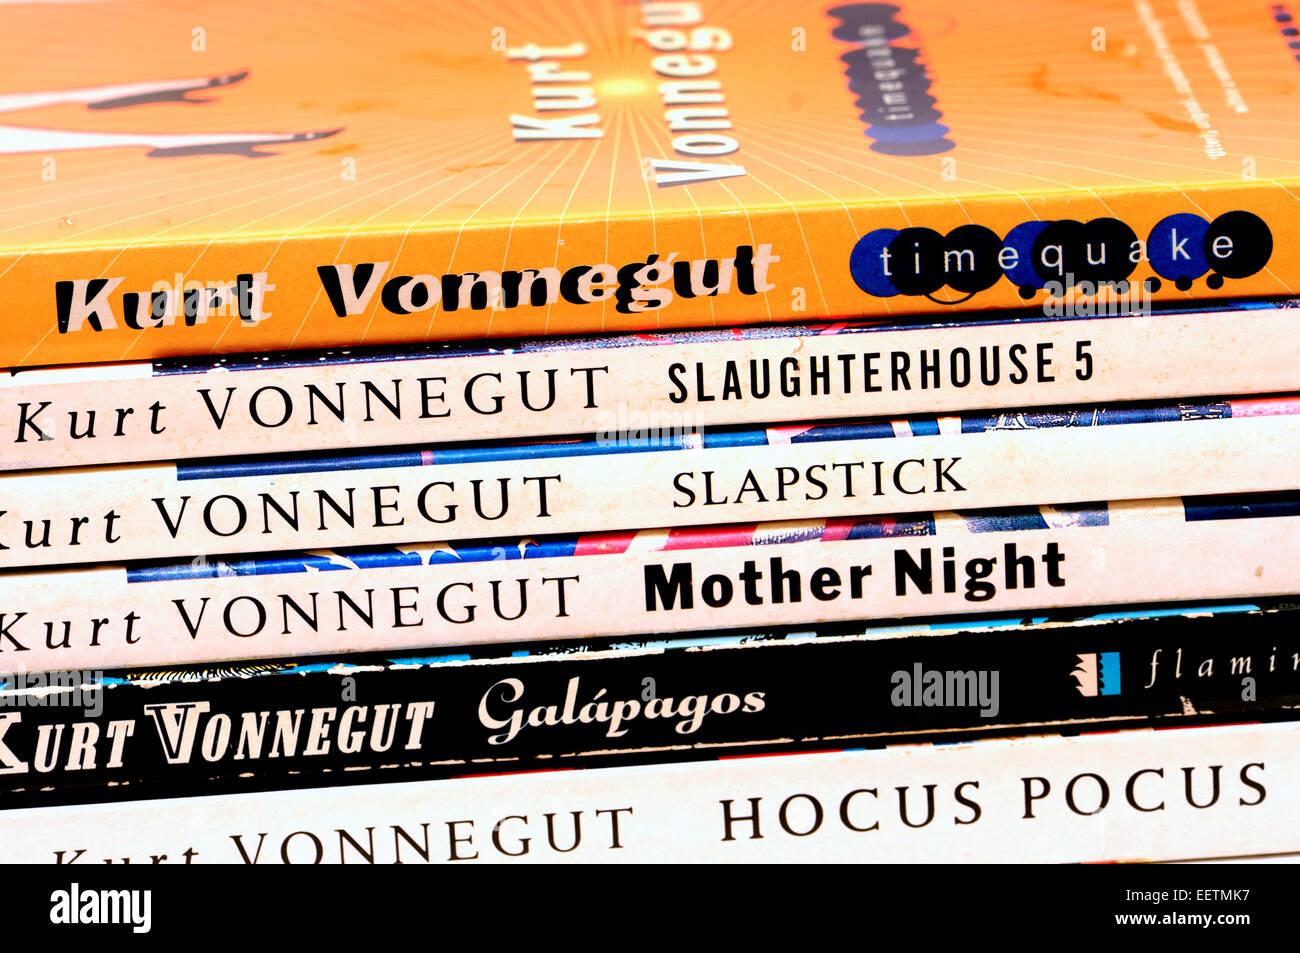 Kurt Vonnegut paperbacks - Stock Image